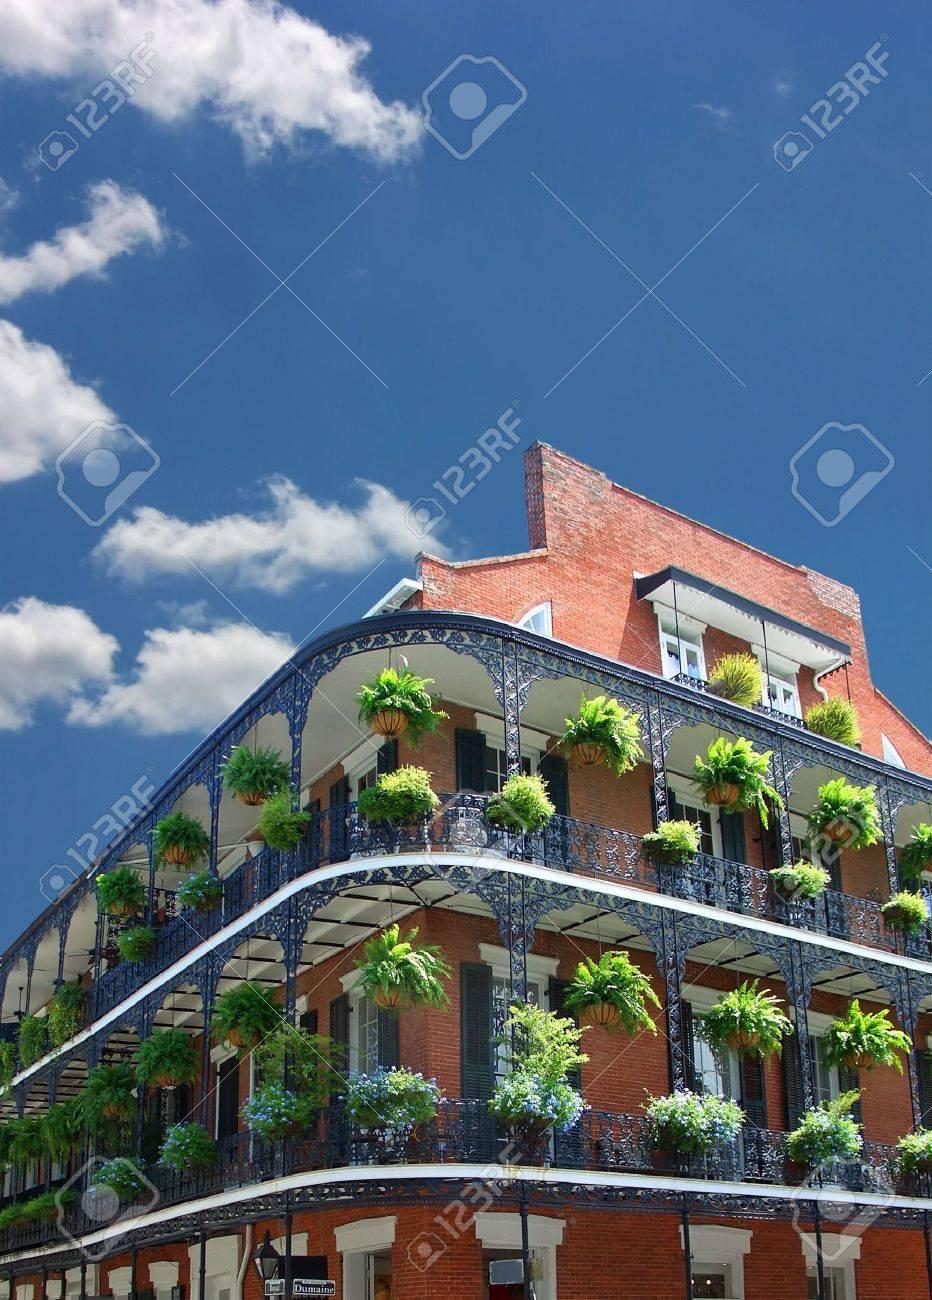 New Orleans architecture, wrought iron balconies Standard-Bild - 3604152